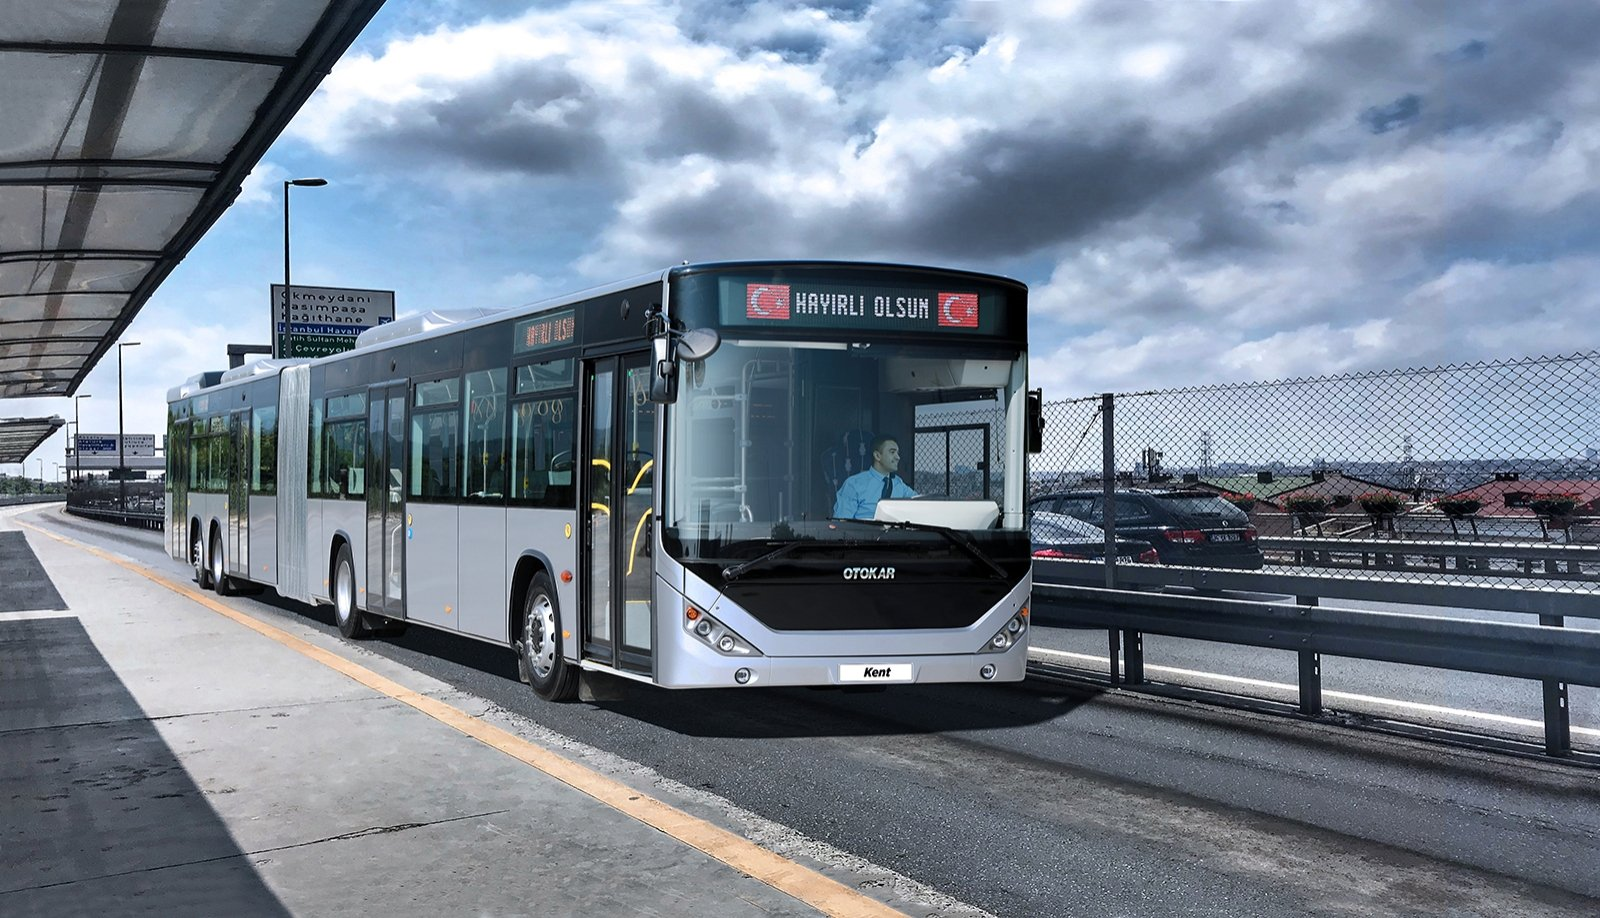 A view of the new metrobus model produced by Otokar, in Istanbul, Turkey, Sept. 6, 2021. (Courtesy of OTOKAR)